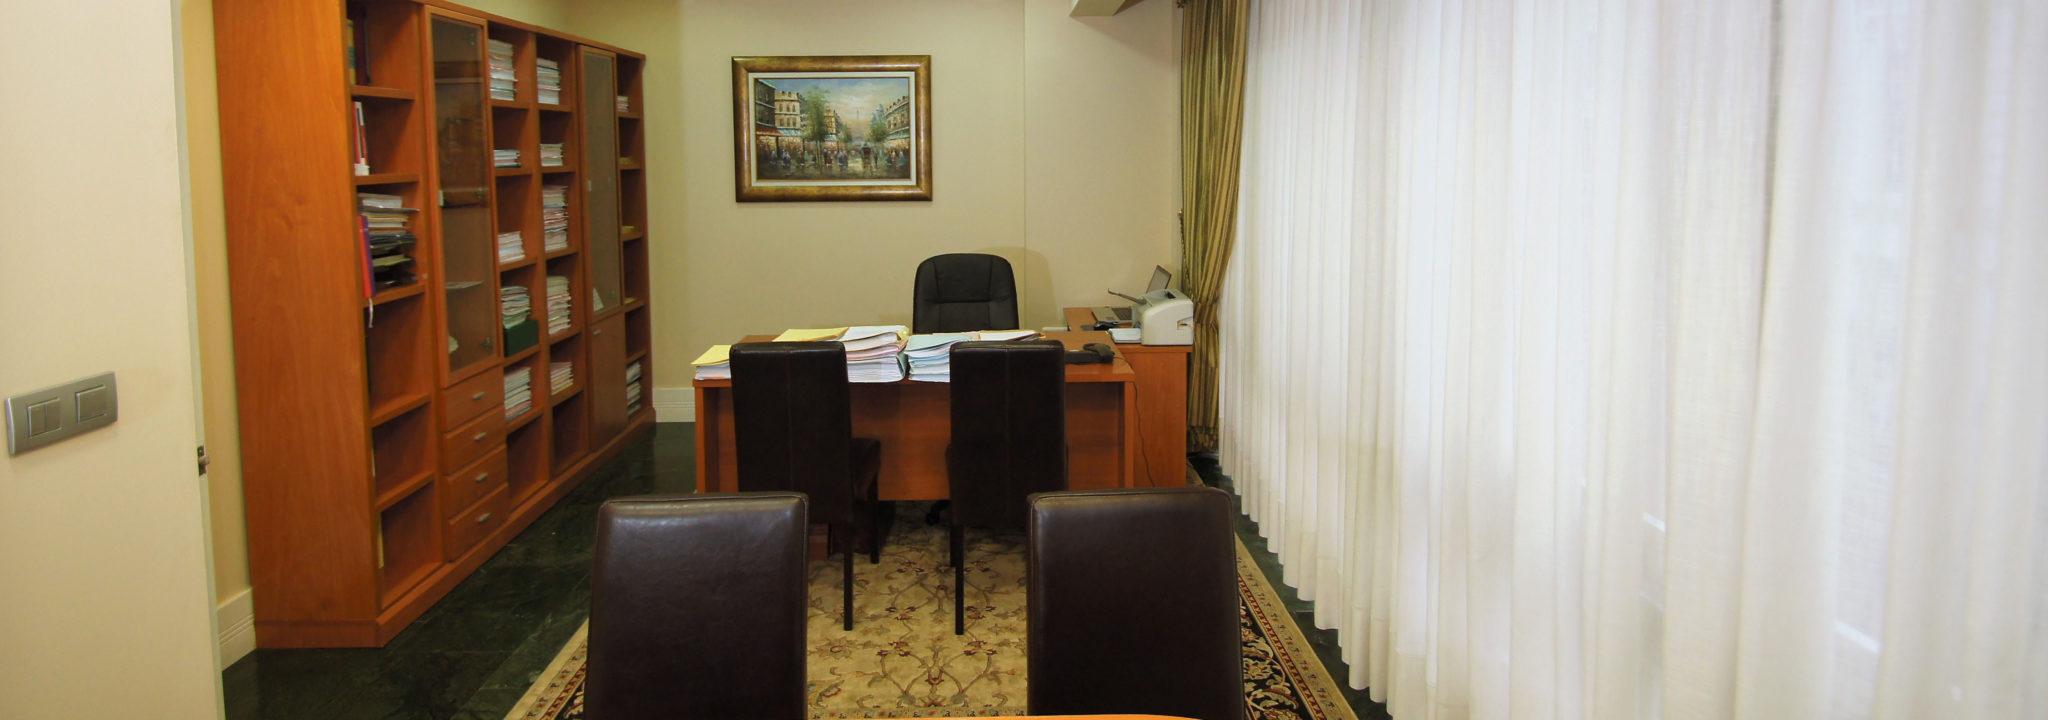 asesoria bilbao despacho